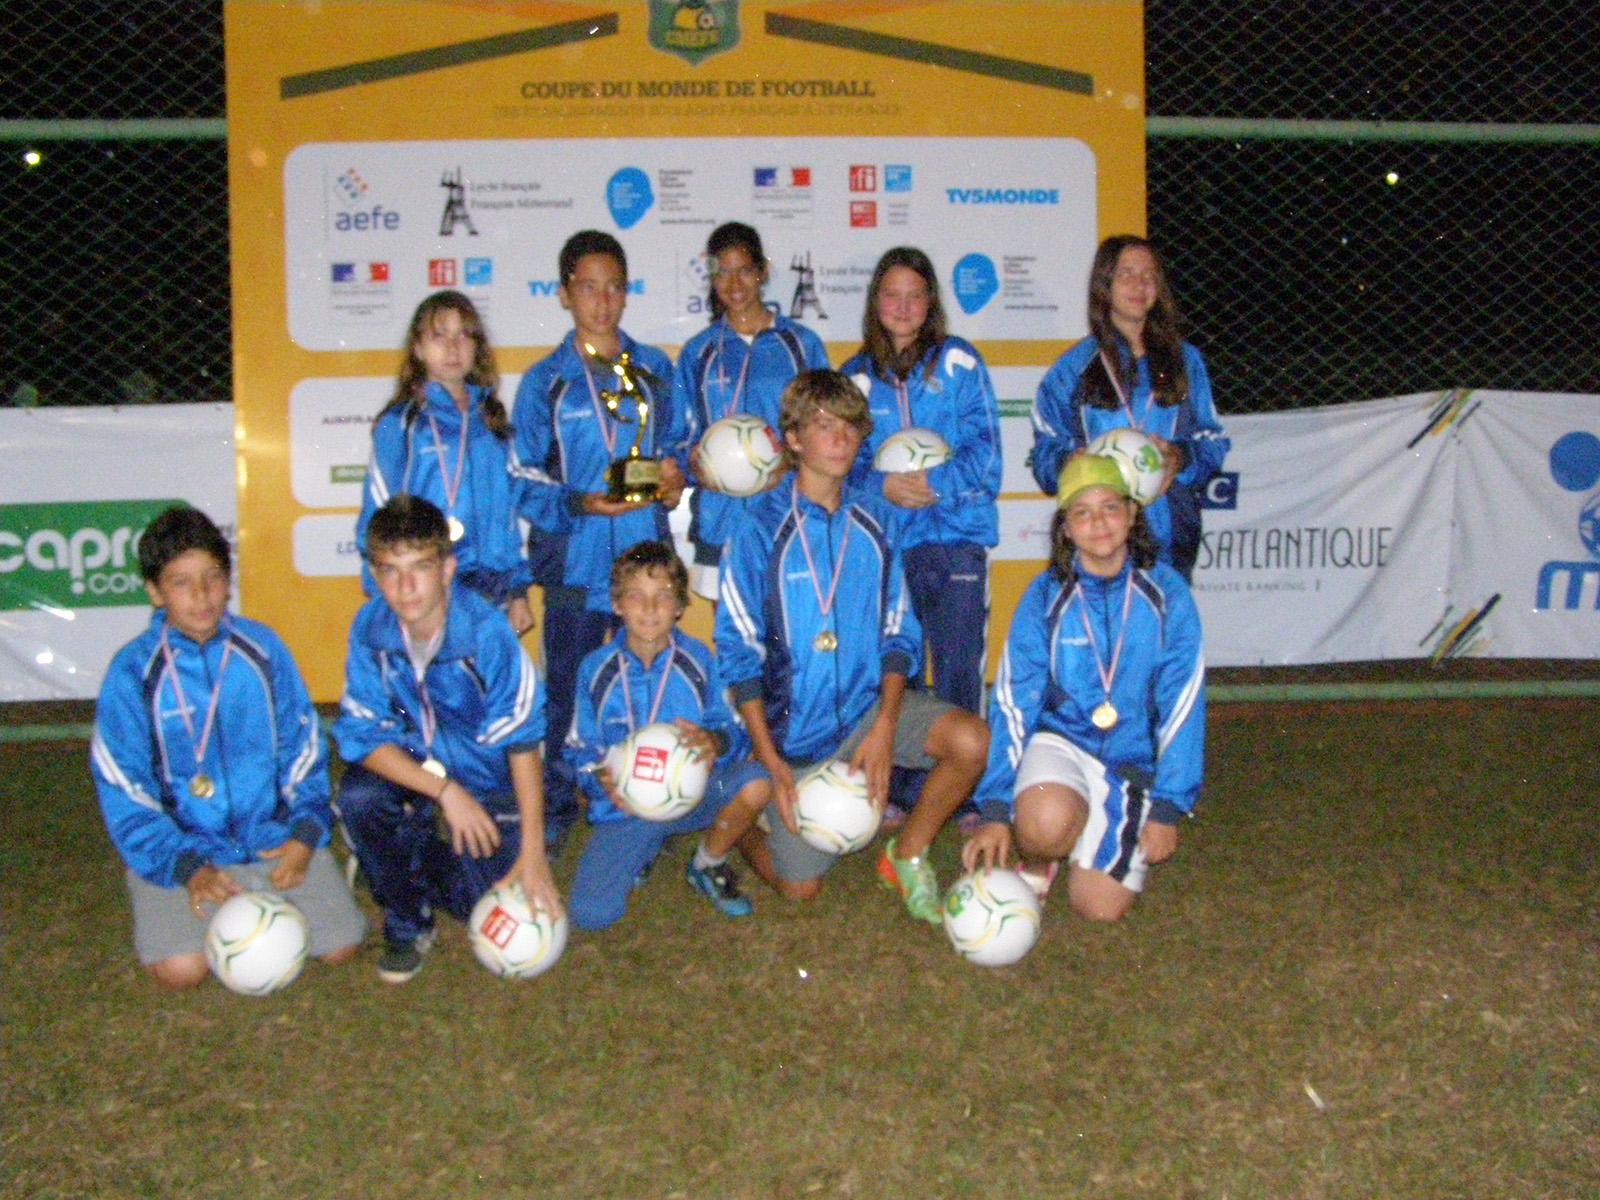 CMEFE 2014, la coupe du fair-play - το κύπελλο fairplay-1